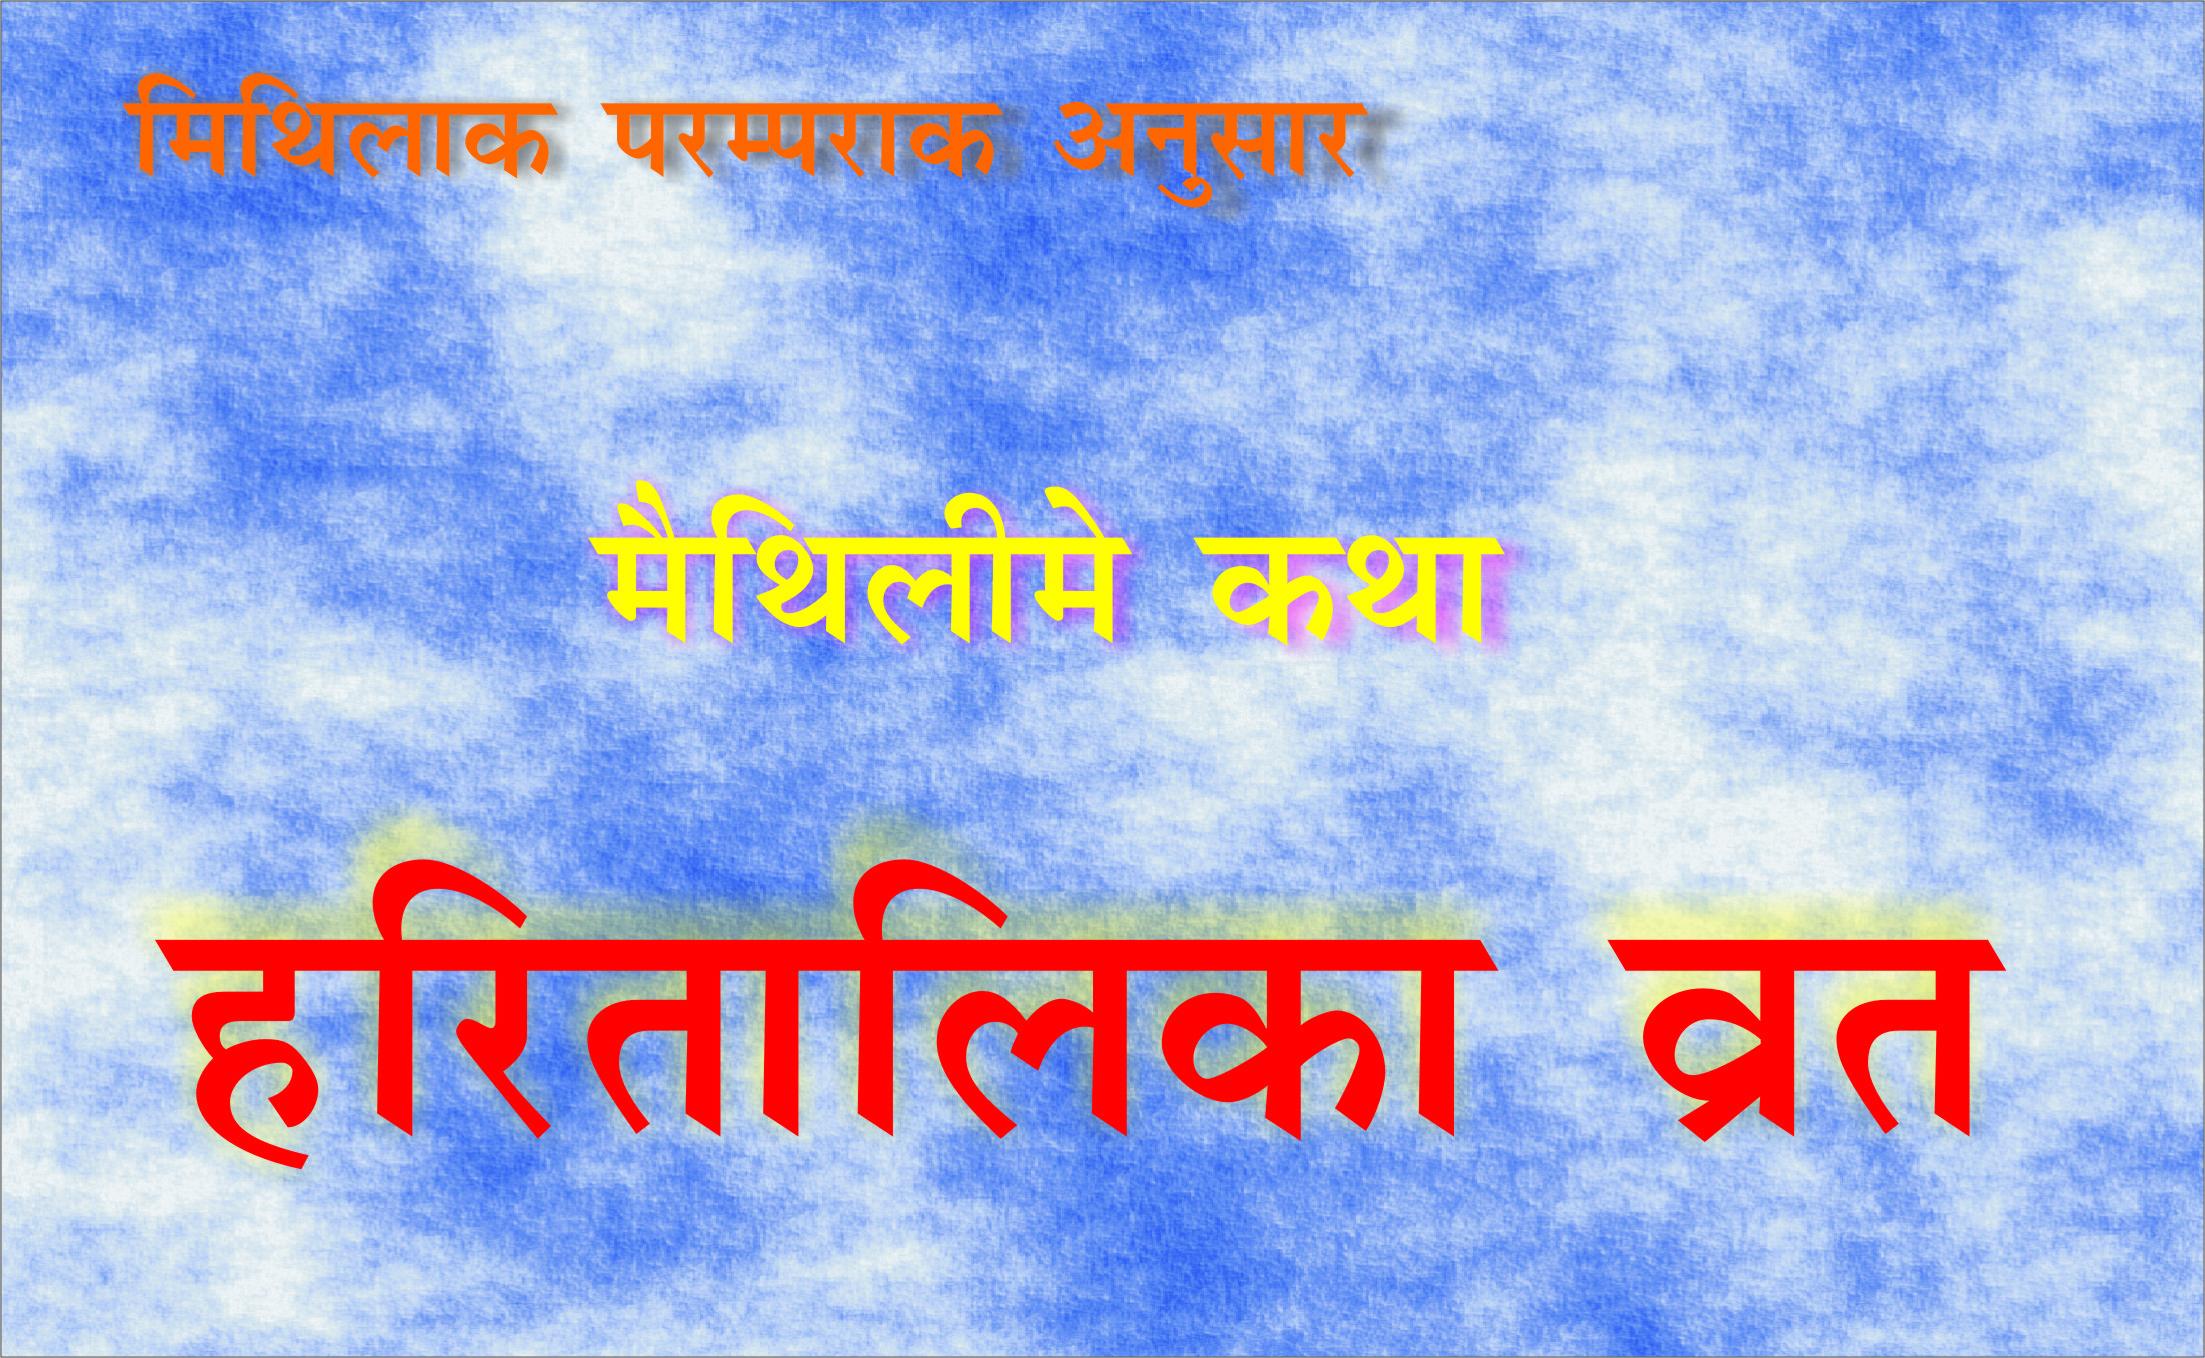 Haritalika Vrat Puja vidhi